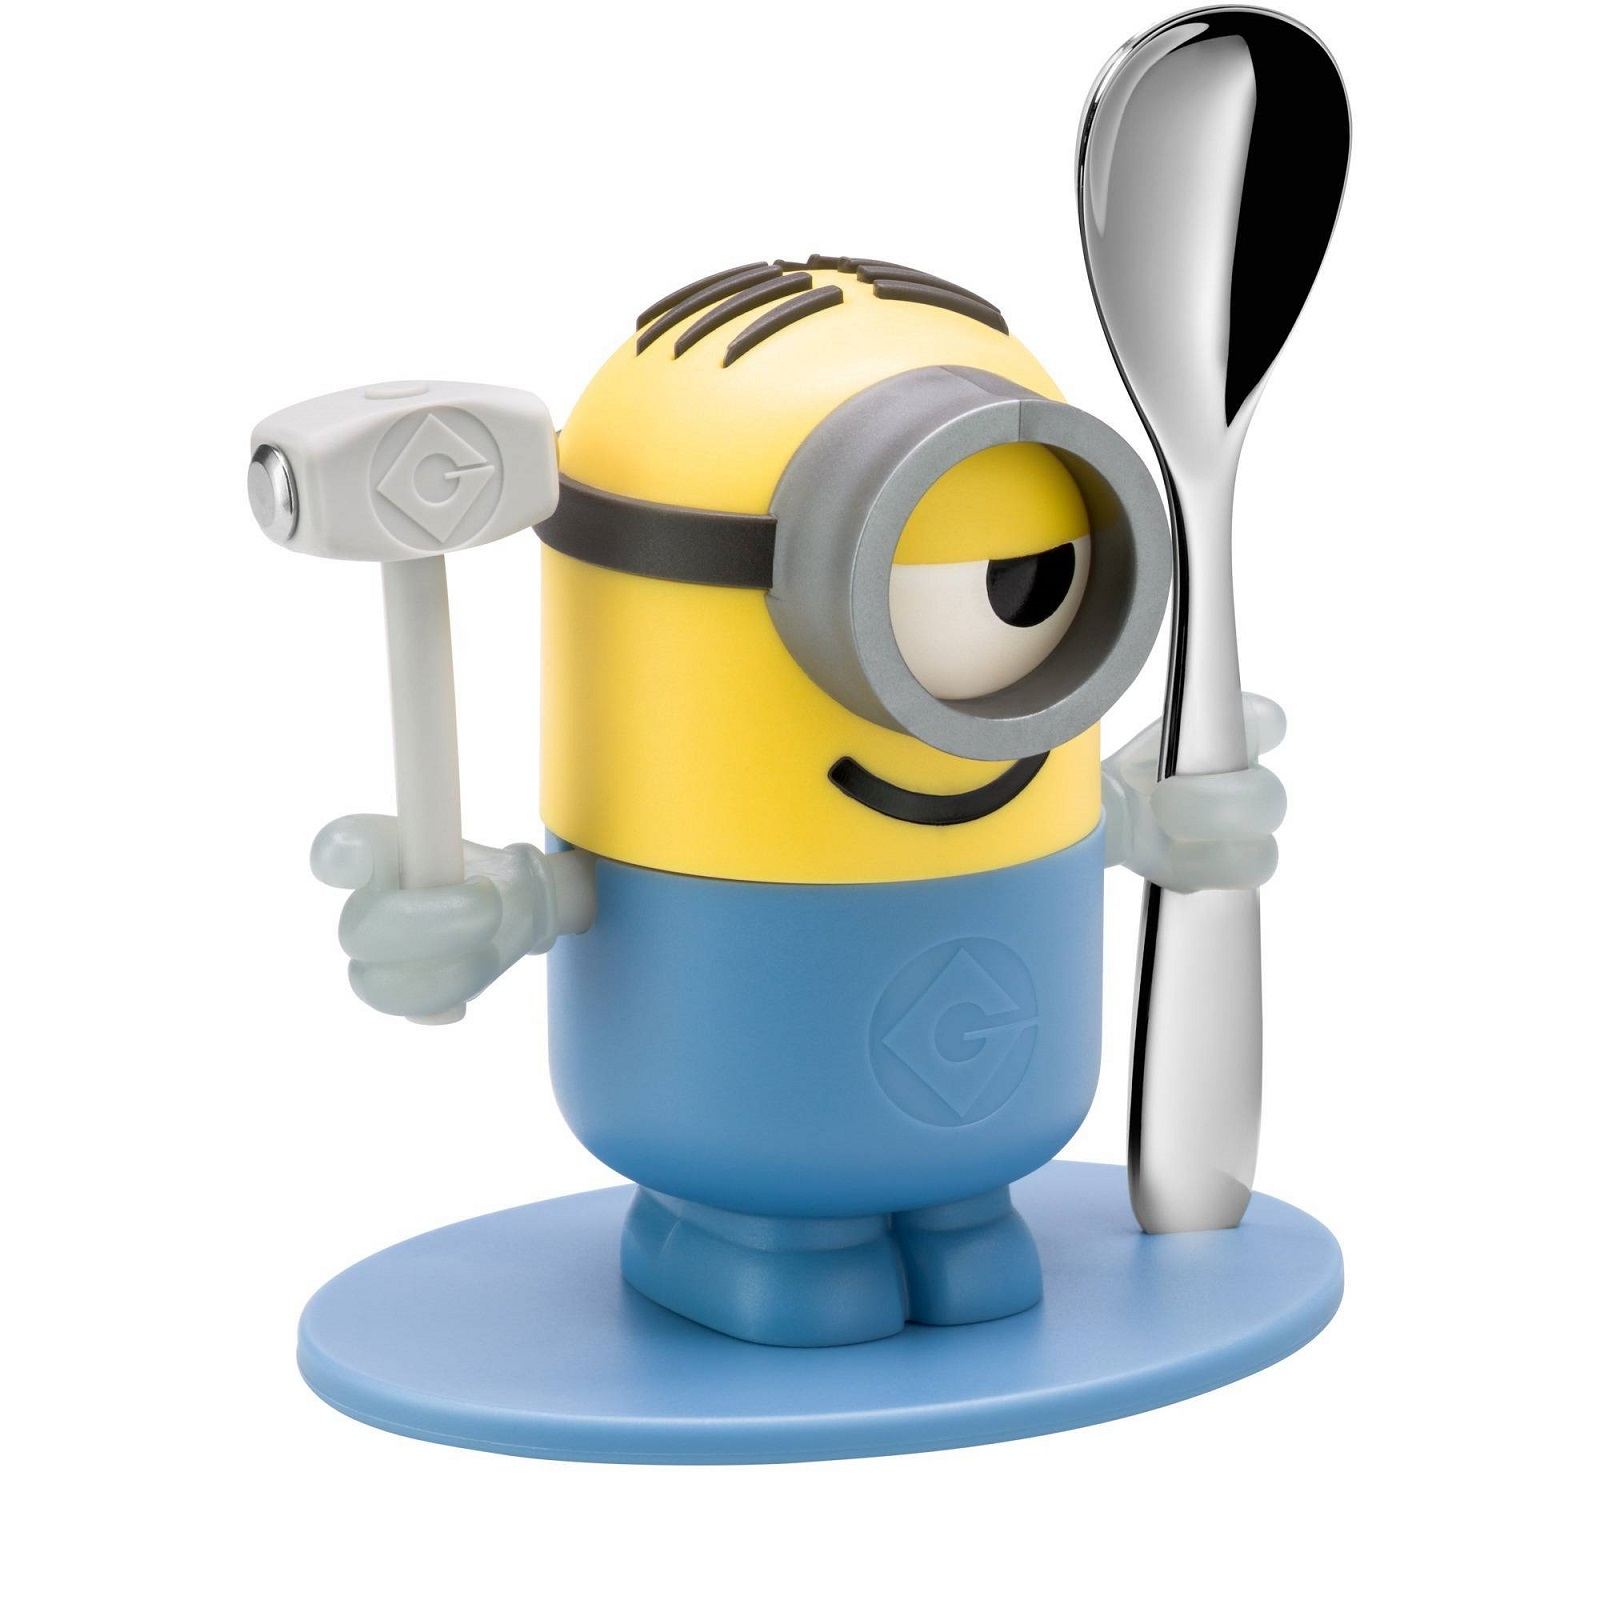 "Онлайн каталог PROMENU: Набор детский: подставка для яйца и ложка ""Миньон"" WMF MINIONS, разноцветный, 2 предмета WMF 12 8622 6040"